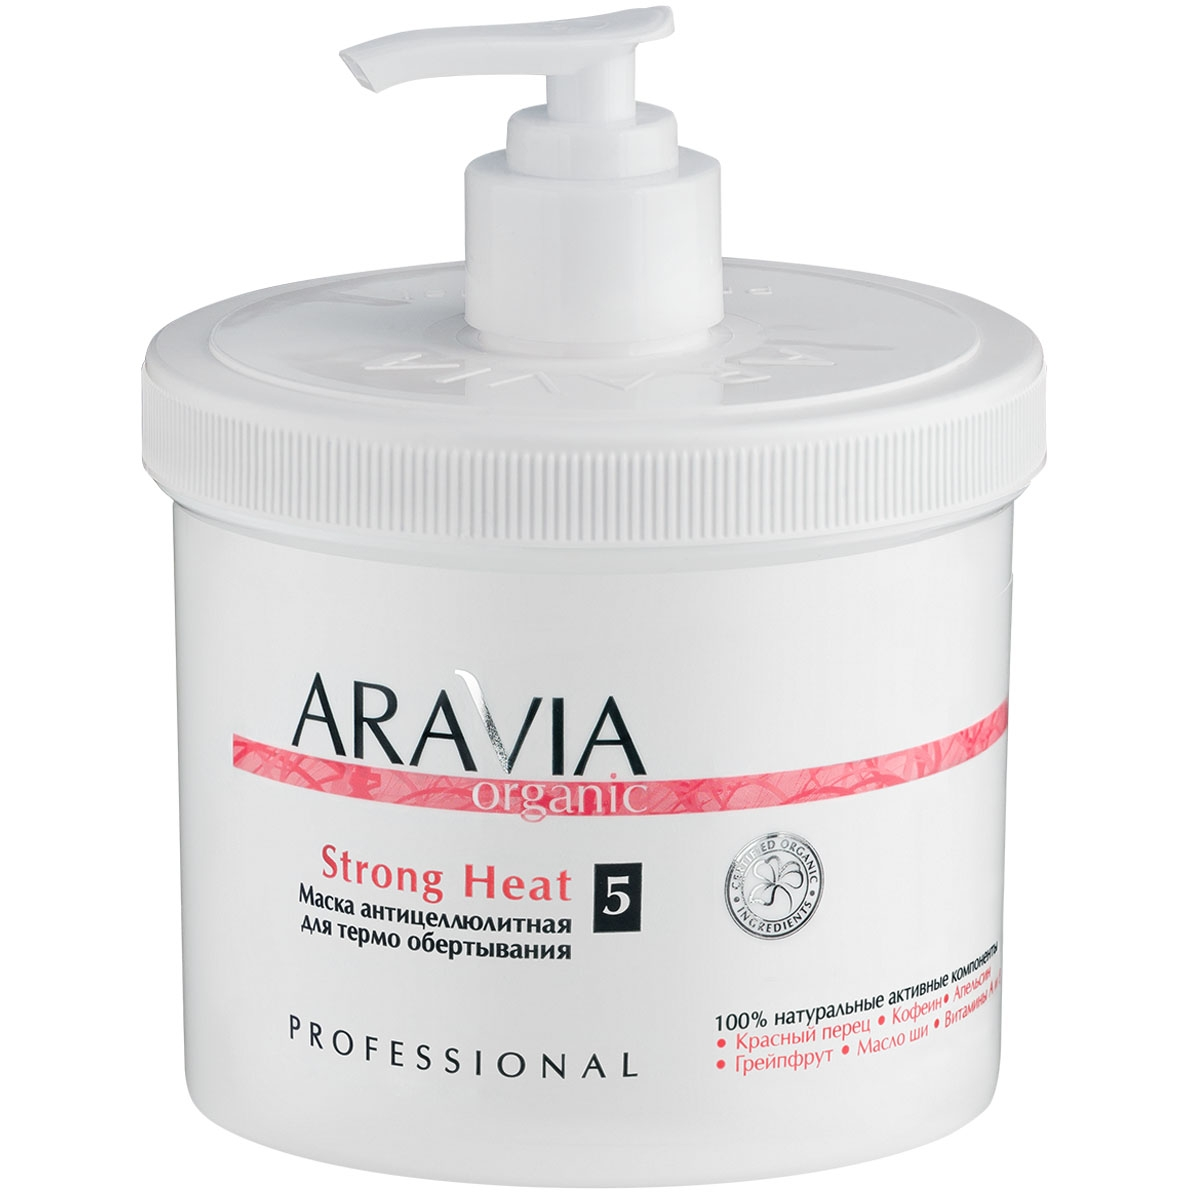 ARAVIA ARAVIA Organic Маска Антицеллюлитная для Термо Обертывания «Strong Heat», 550 мл